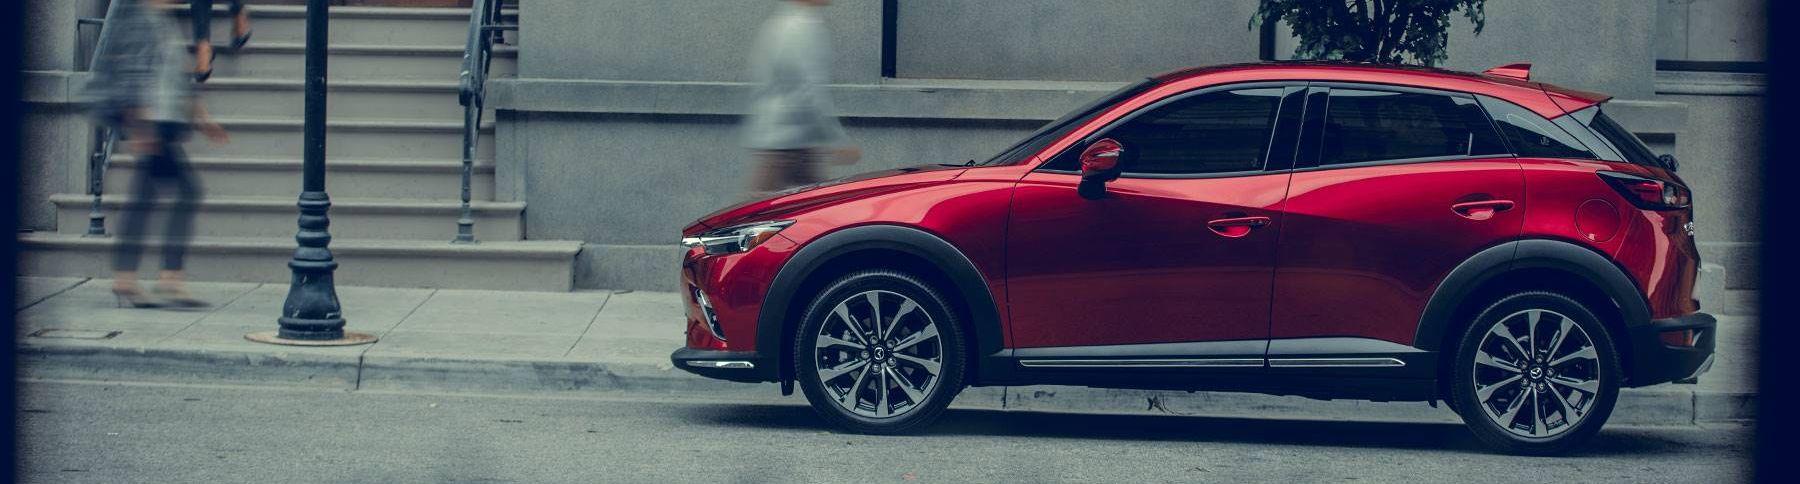 Mazda Cx 3 Lease >> 2019 Mazda Cx 3 Leasing Near Garden City Ny Wantagh Mazda